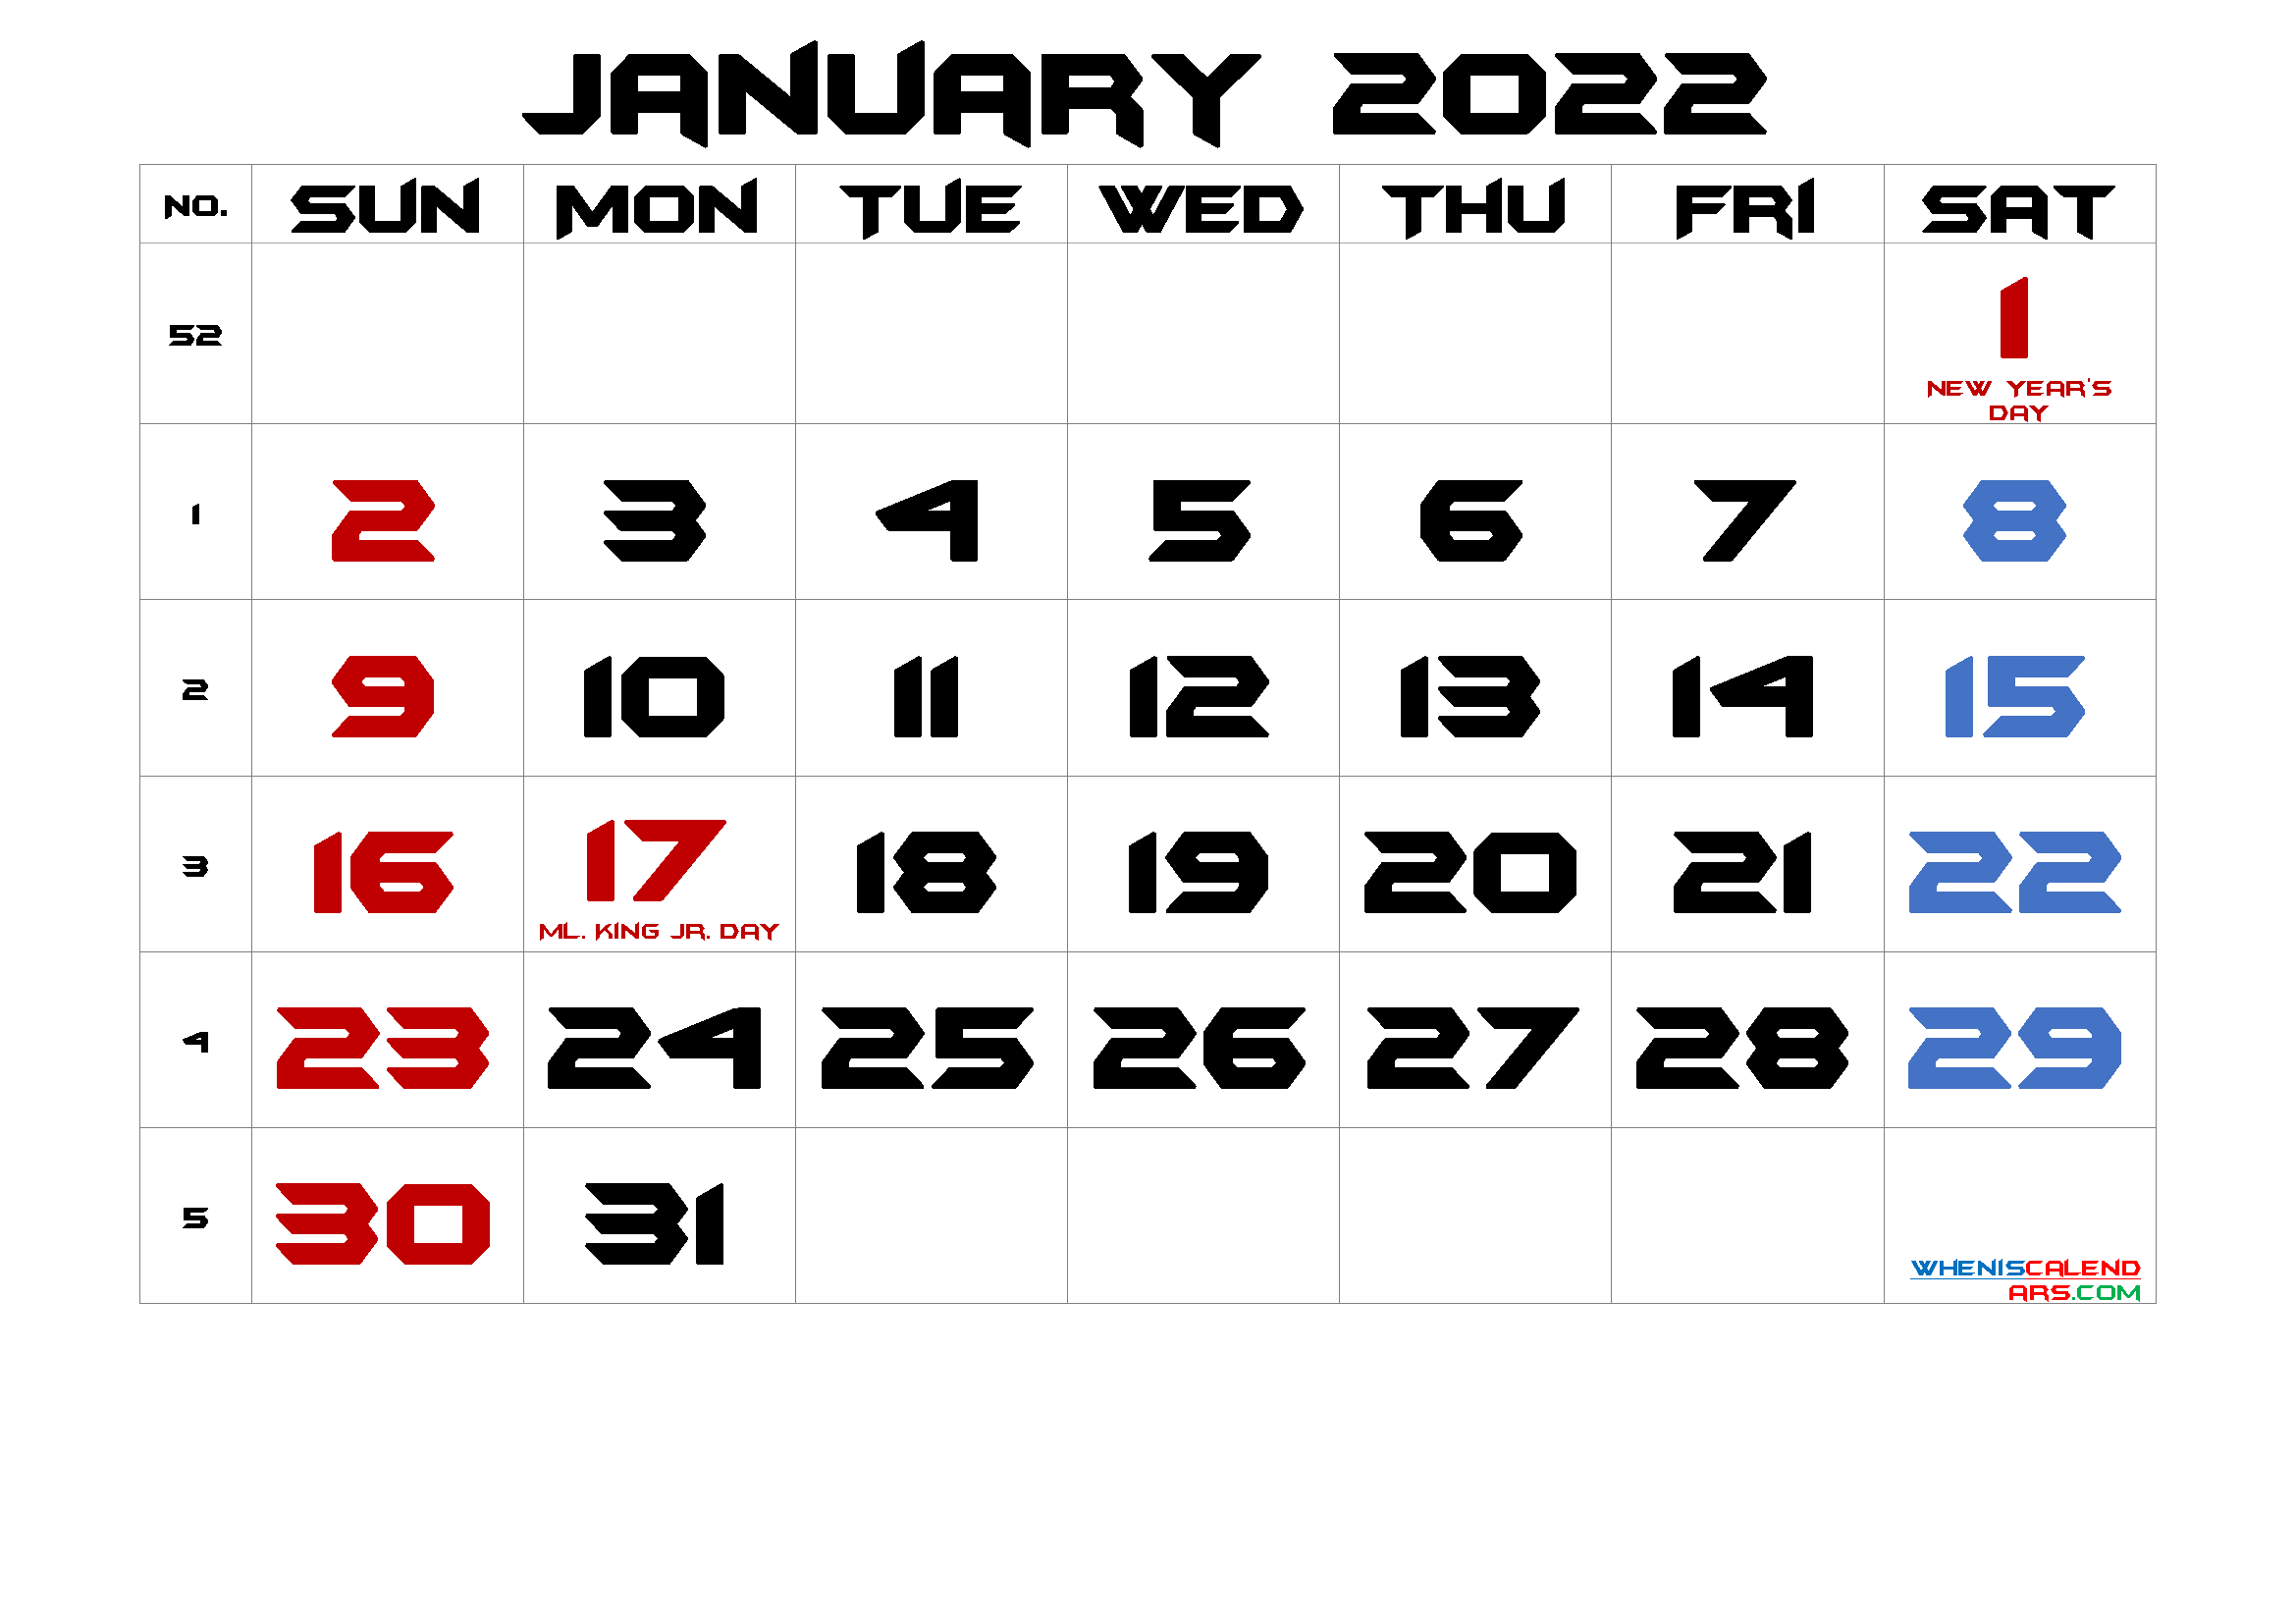 January 2022 Printable Calendar With Holidays Inside Monthly Calendar January 2022